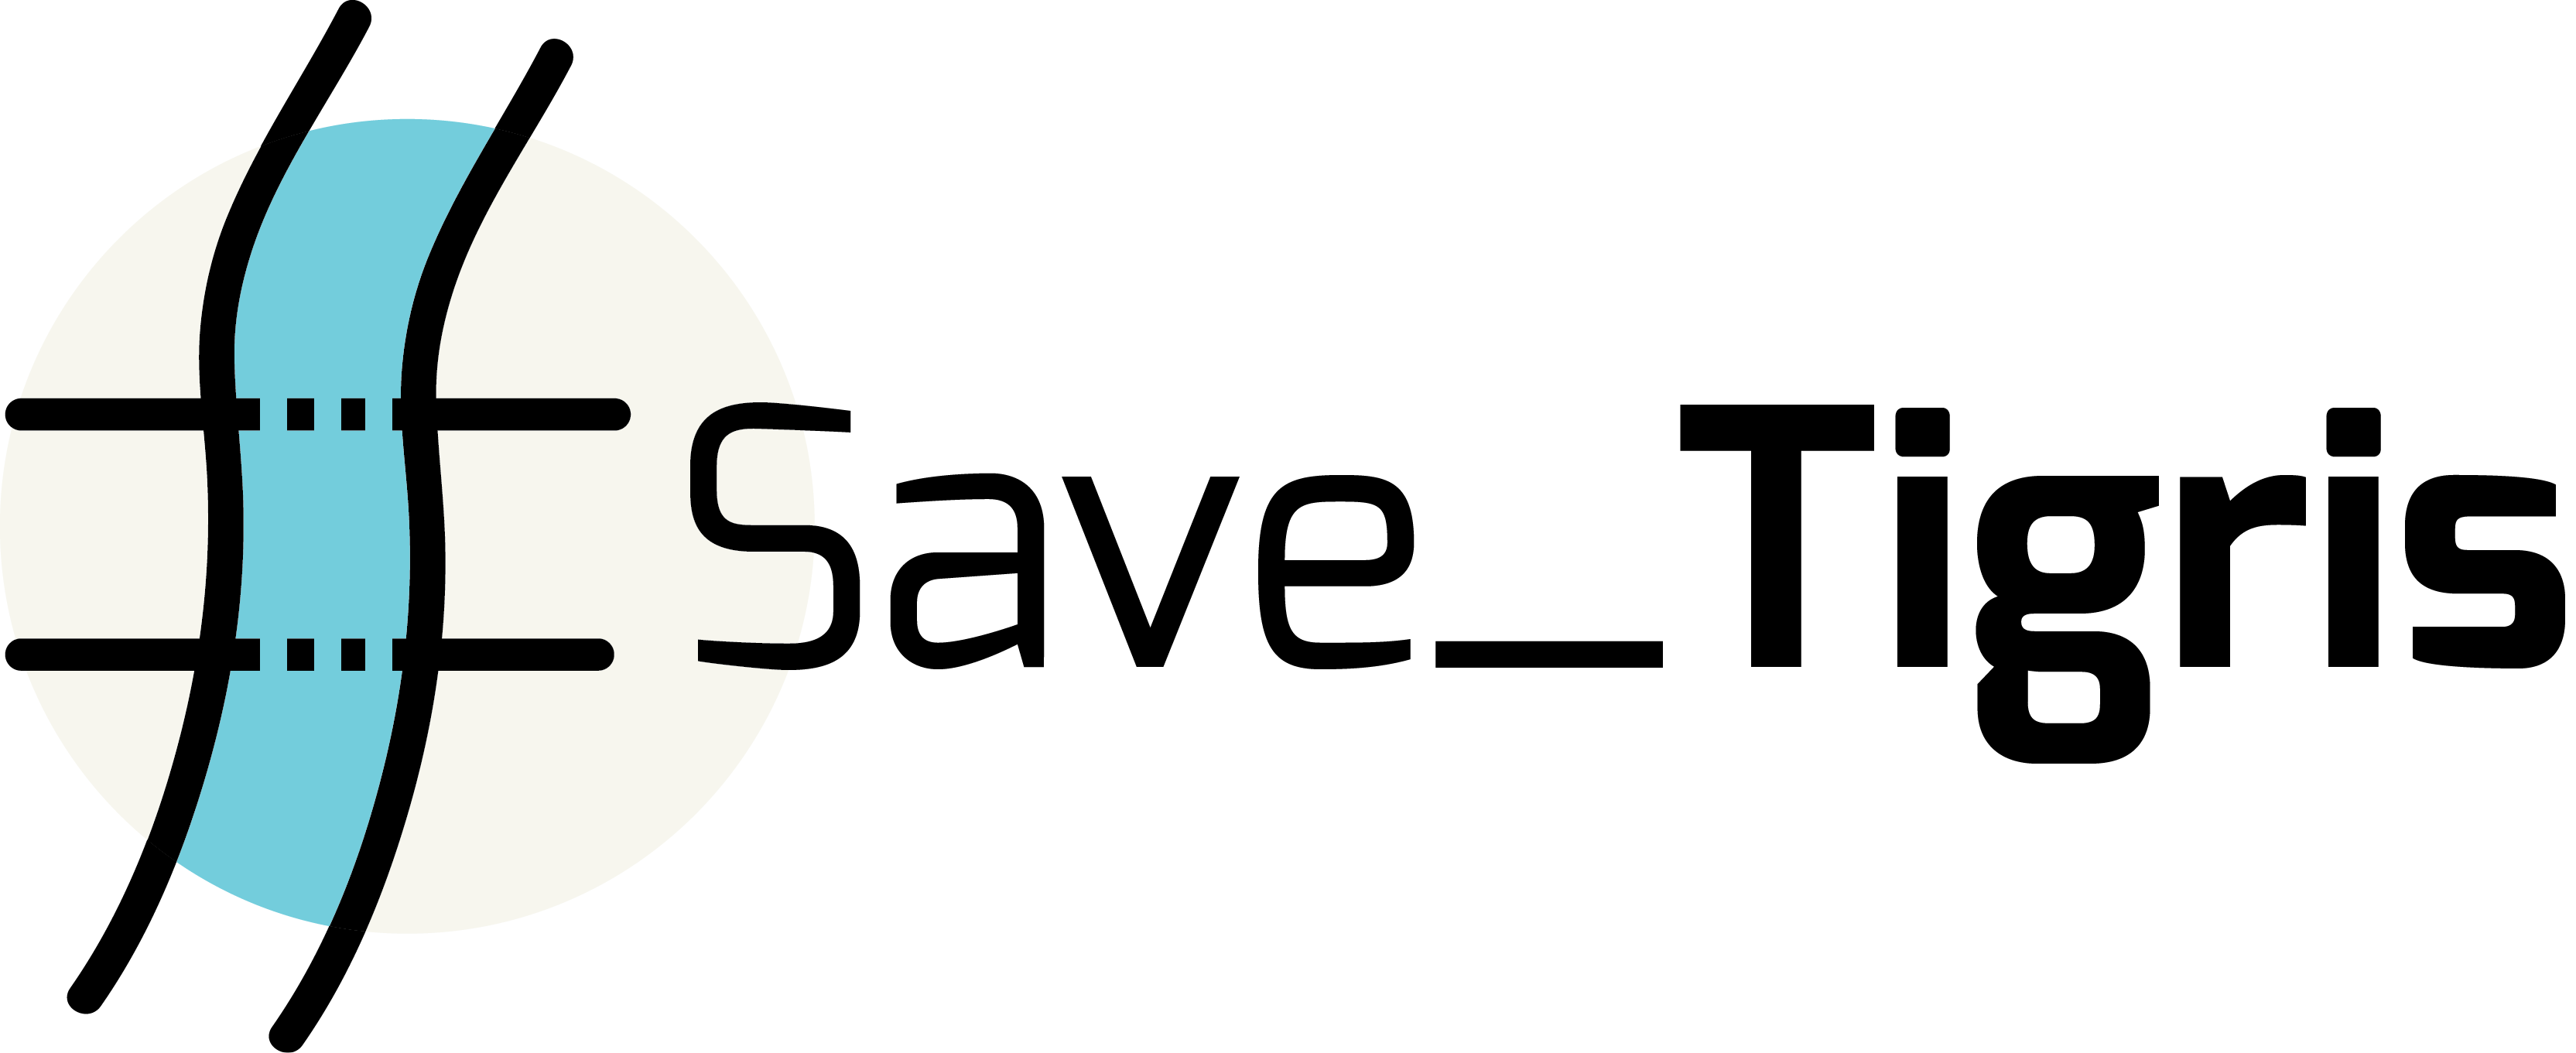 Safe the Tigris Campaign logo